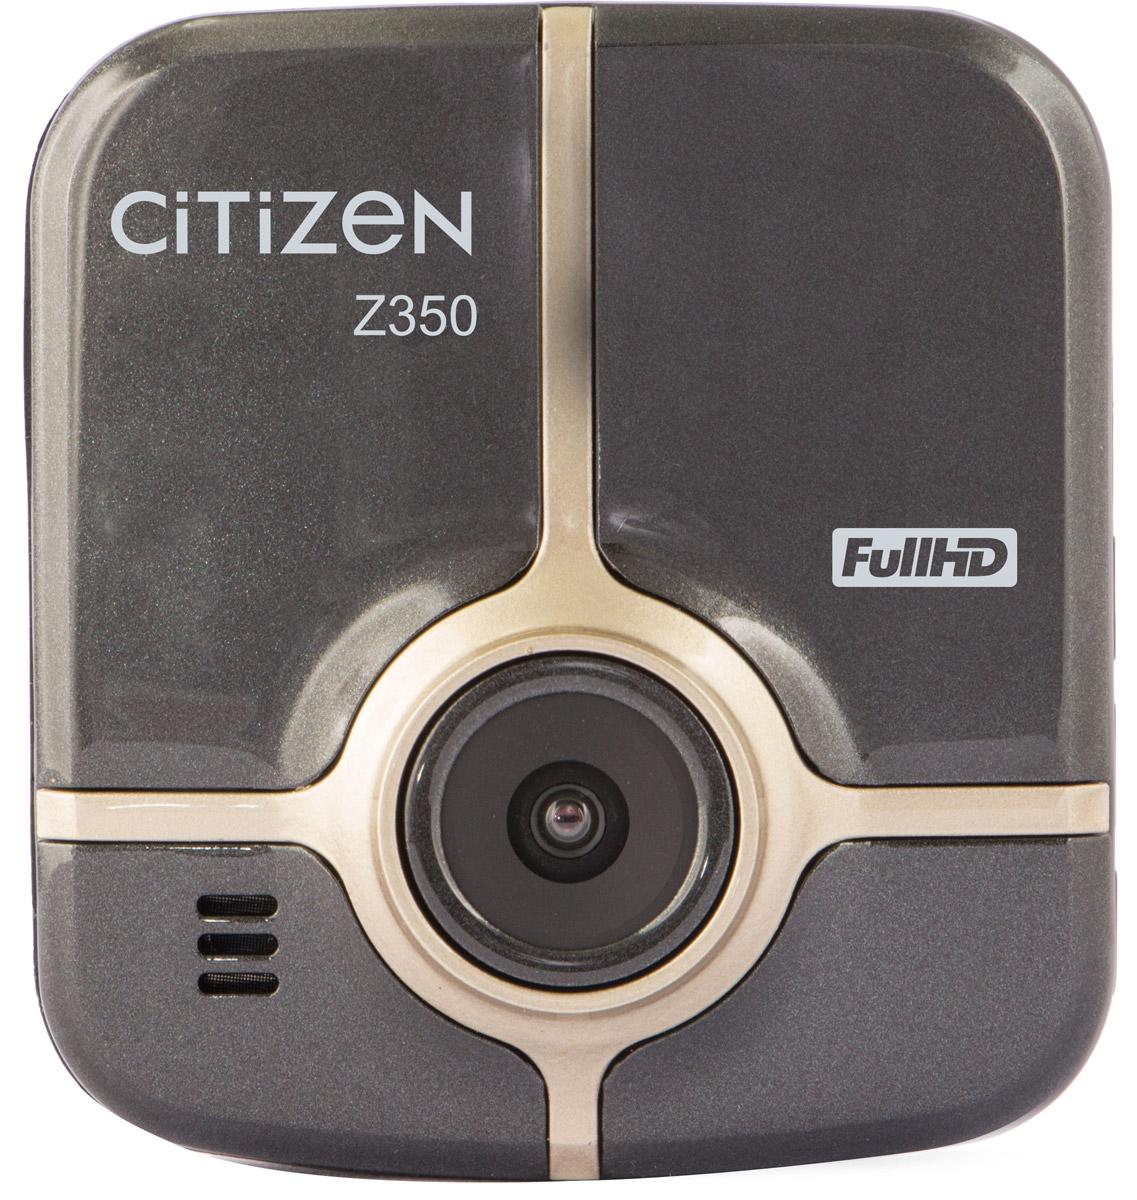 CiTiZeN Z350 автомобильный видеорегистратор видеорегистратор citizen z350 черный